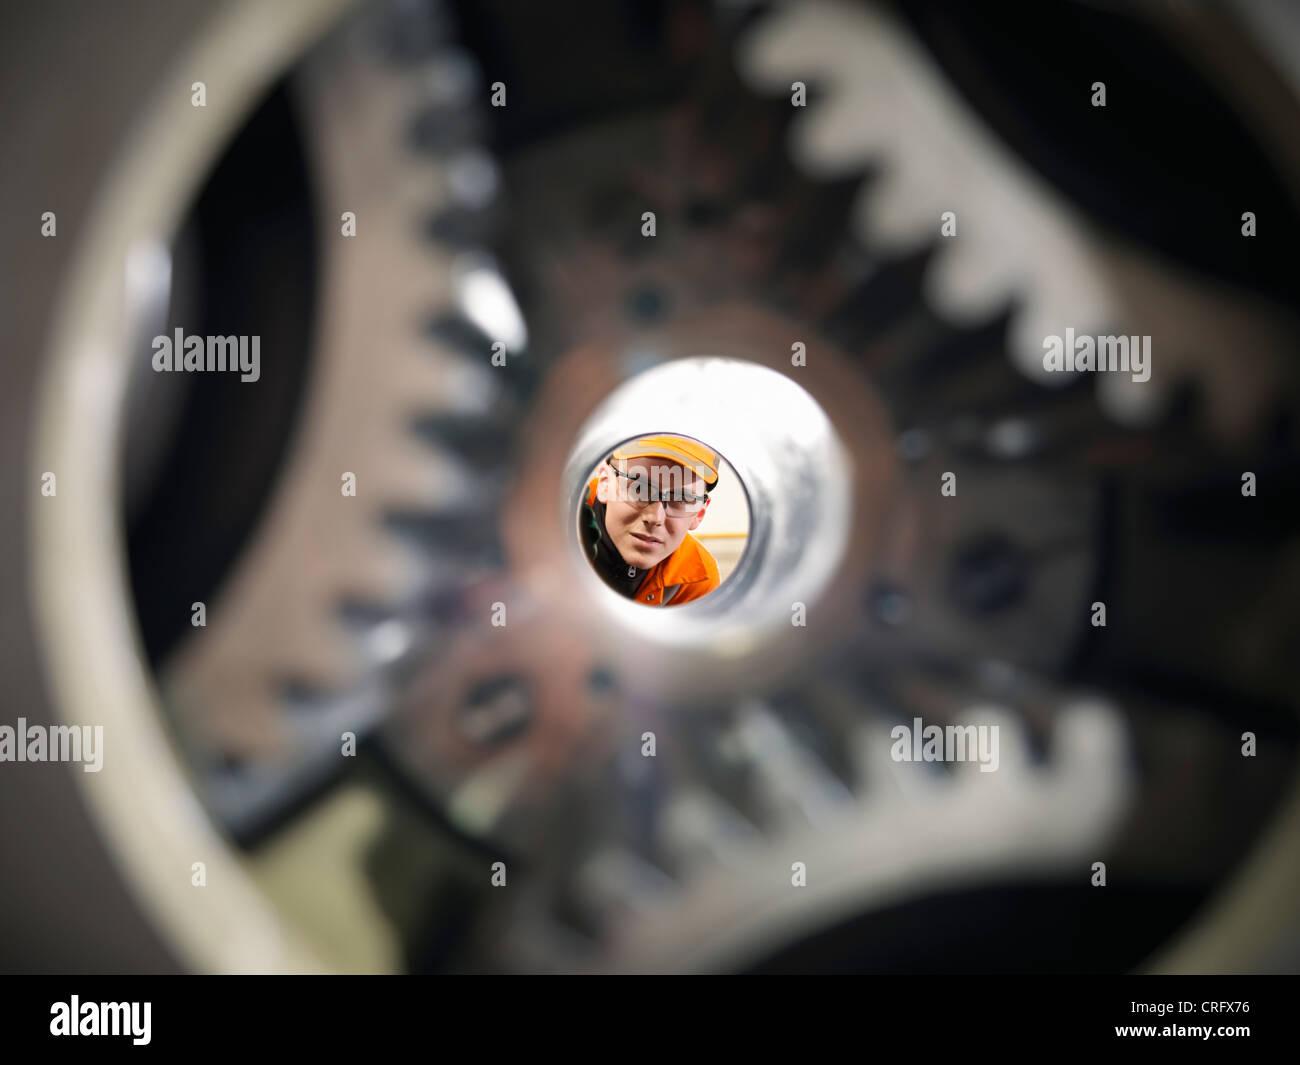 Lehrling Ingenieur Prüfung Zahnräder Stockbild